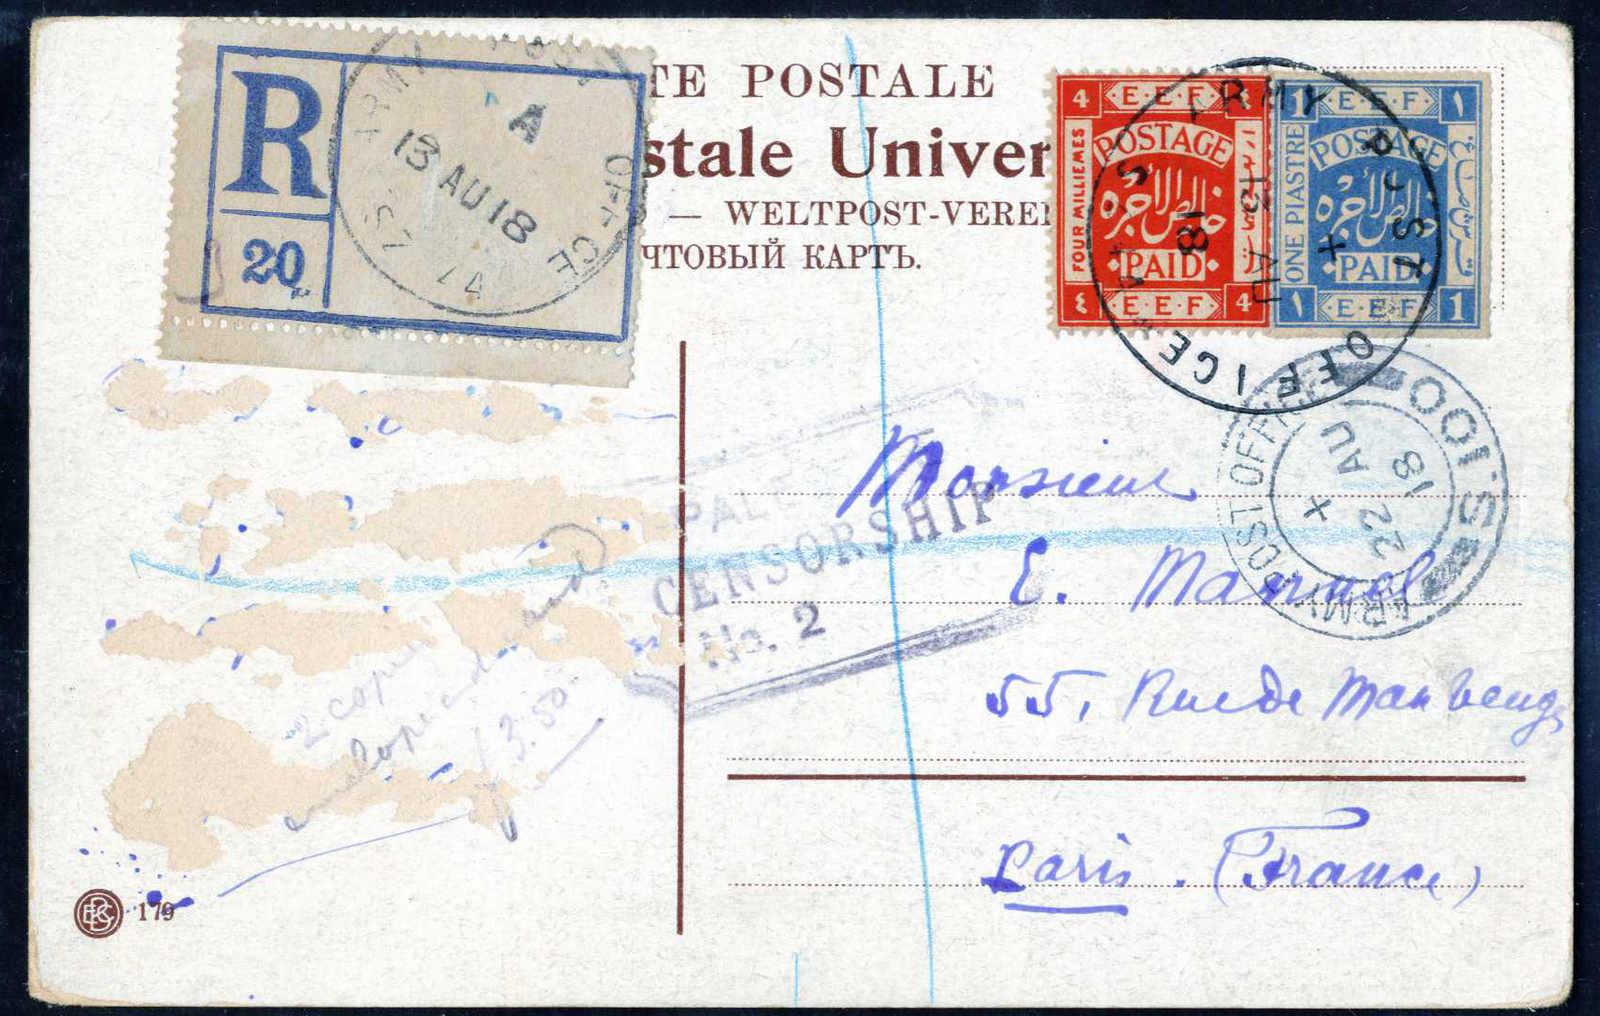 Lot 966 - andere gebiete Palästina E.E.F und Britische Verwaltungs Periode -  HA HARMERS AUCTIONS S.A. Treasure Hunt 3